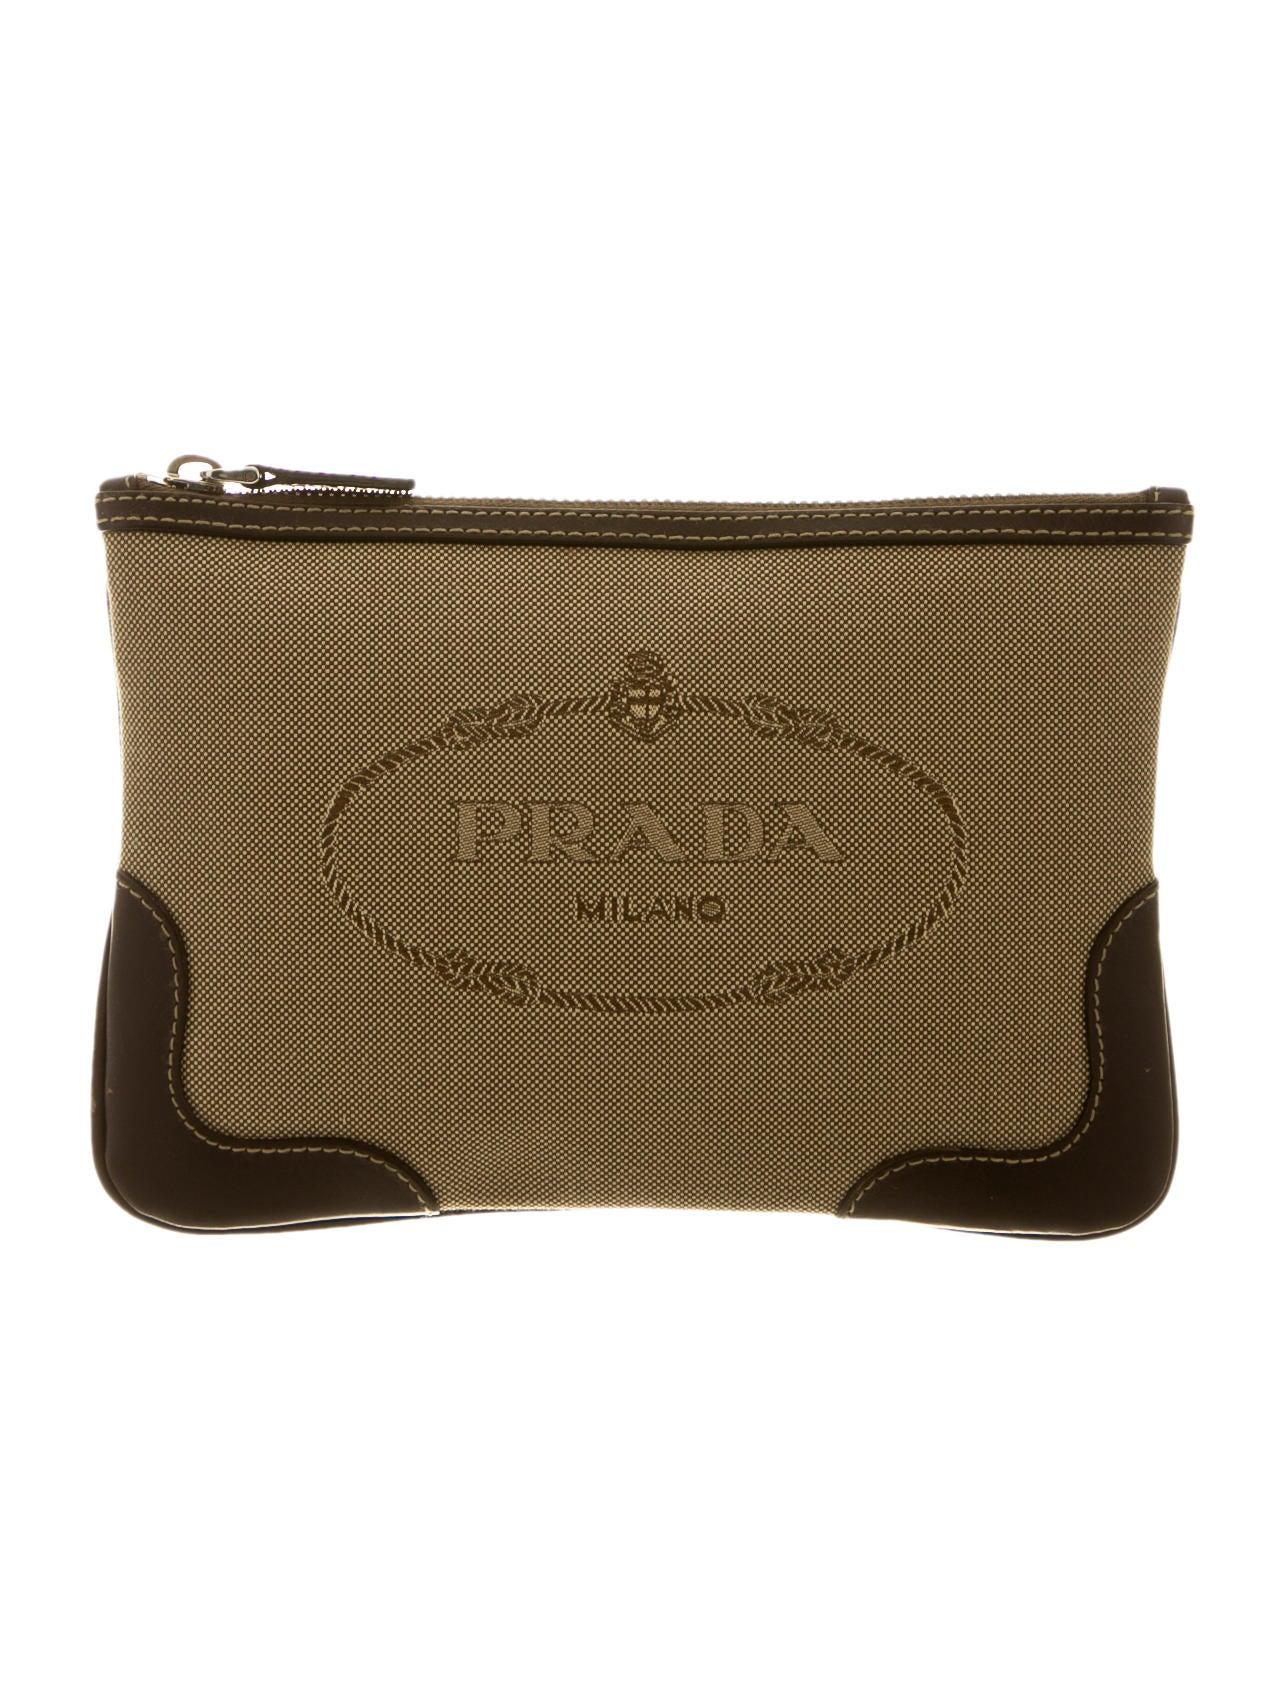 prada red leather wallet - Prada Canapa Clutch - Handbags - PRA58423 | The RealReal